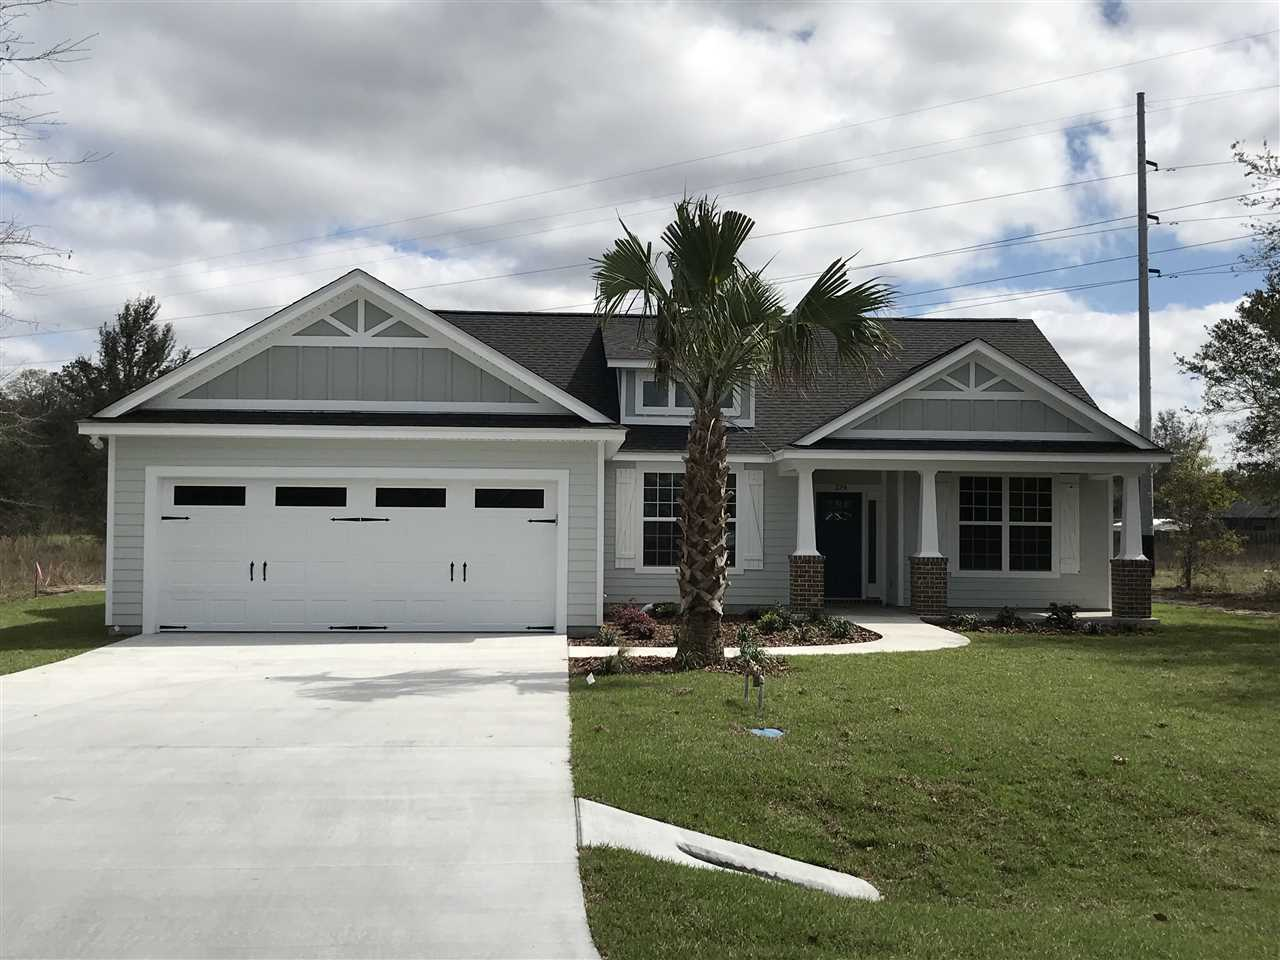 Property ID 286054